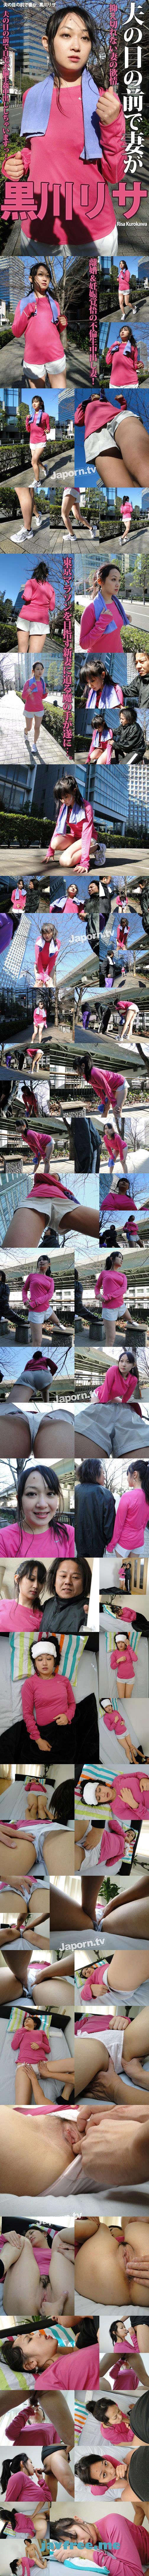 [DSAM 31] 夫の目の前で妻が : 黒川リサ 黒川リサ Risa Kurokawa DSAM